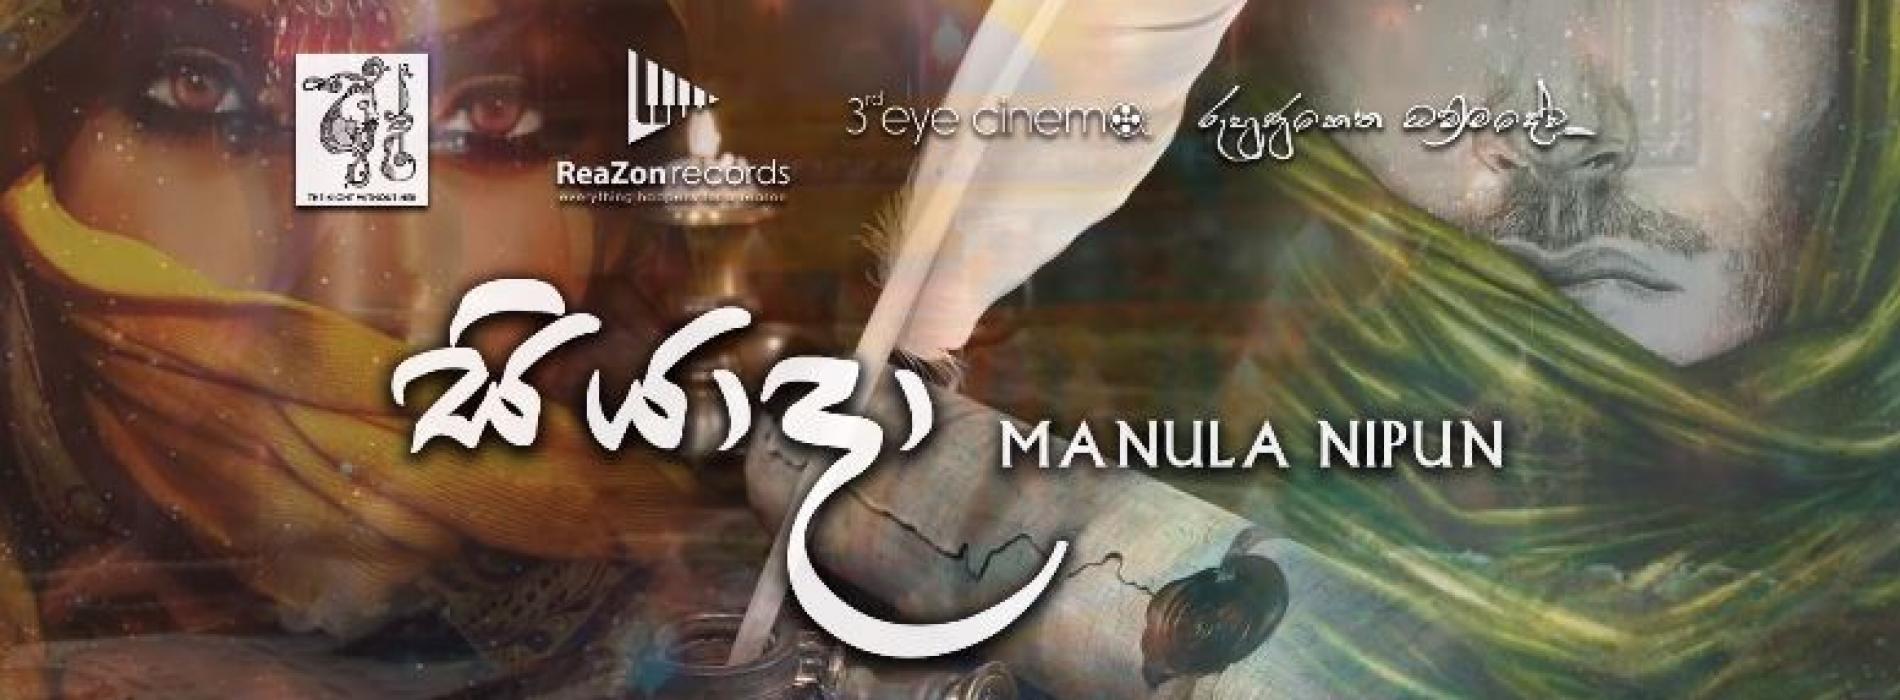 New Music : Siyada (සියාදා ) – Manula Nipun [Lyric Video]